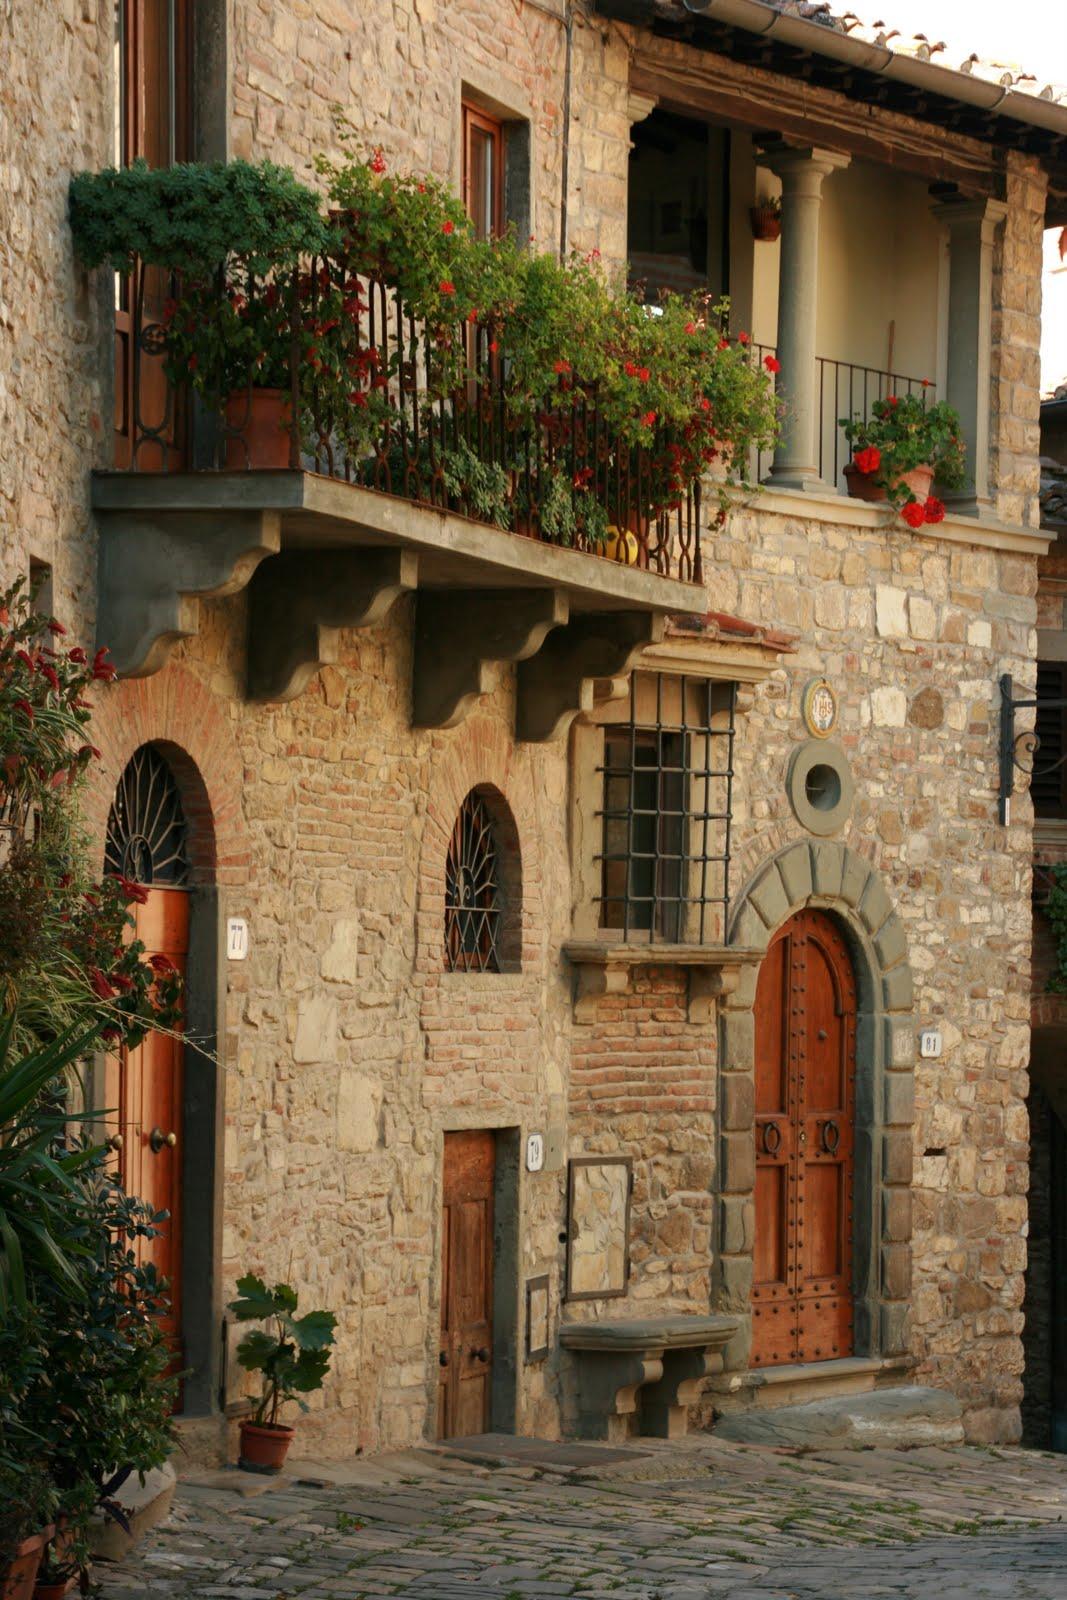 Josephinas Balkon mit Blick auf den Marktplatz